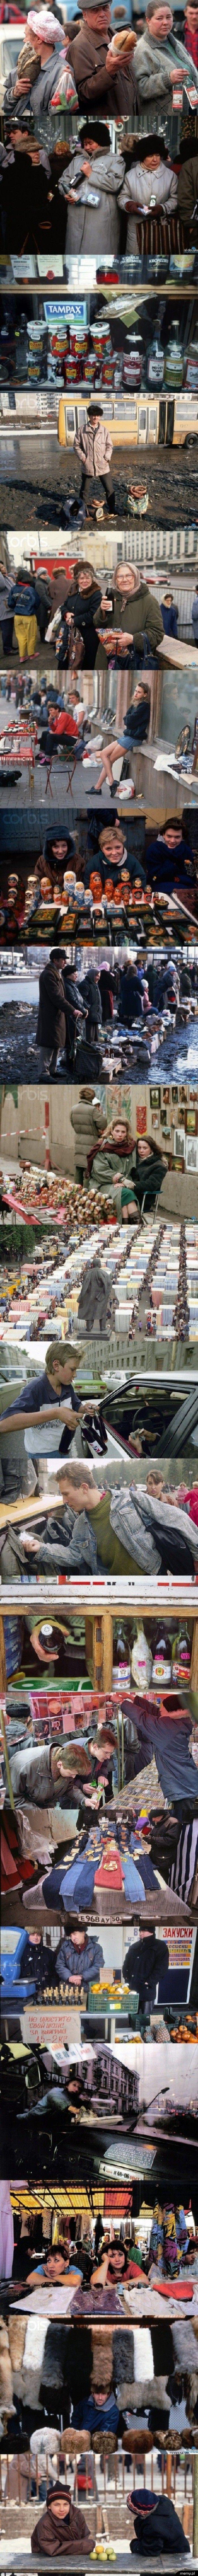 Rosja w latach '90